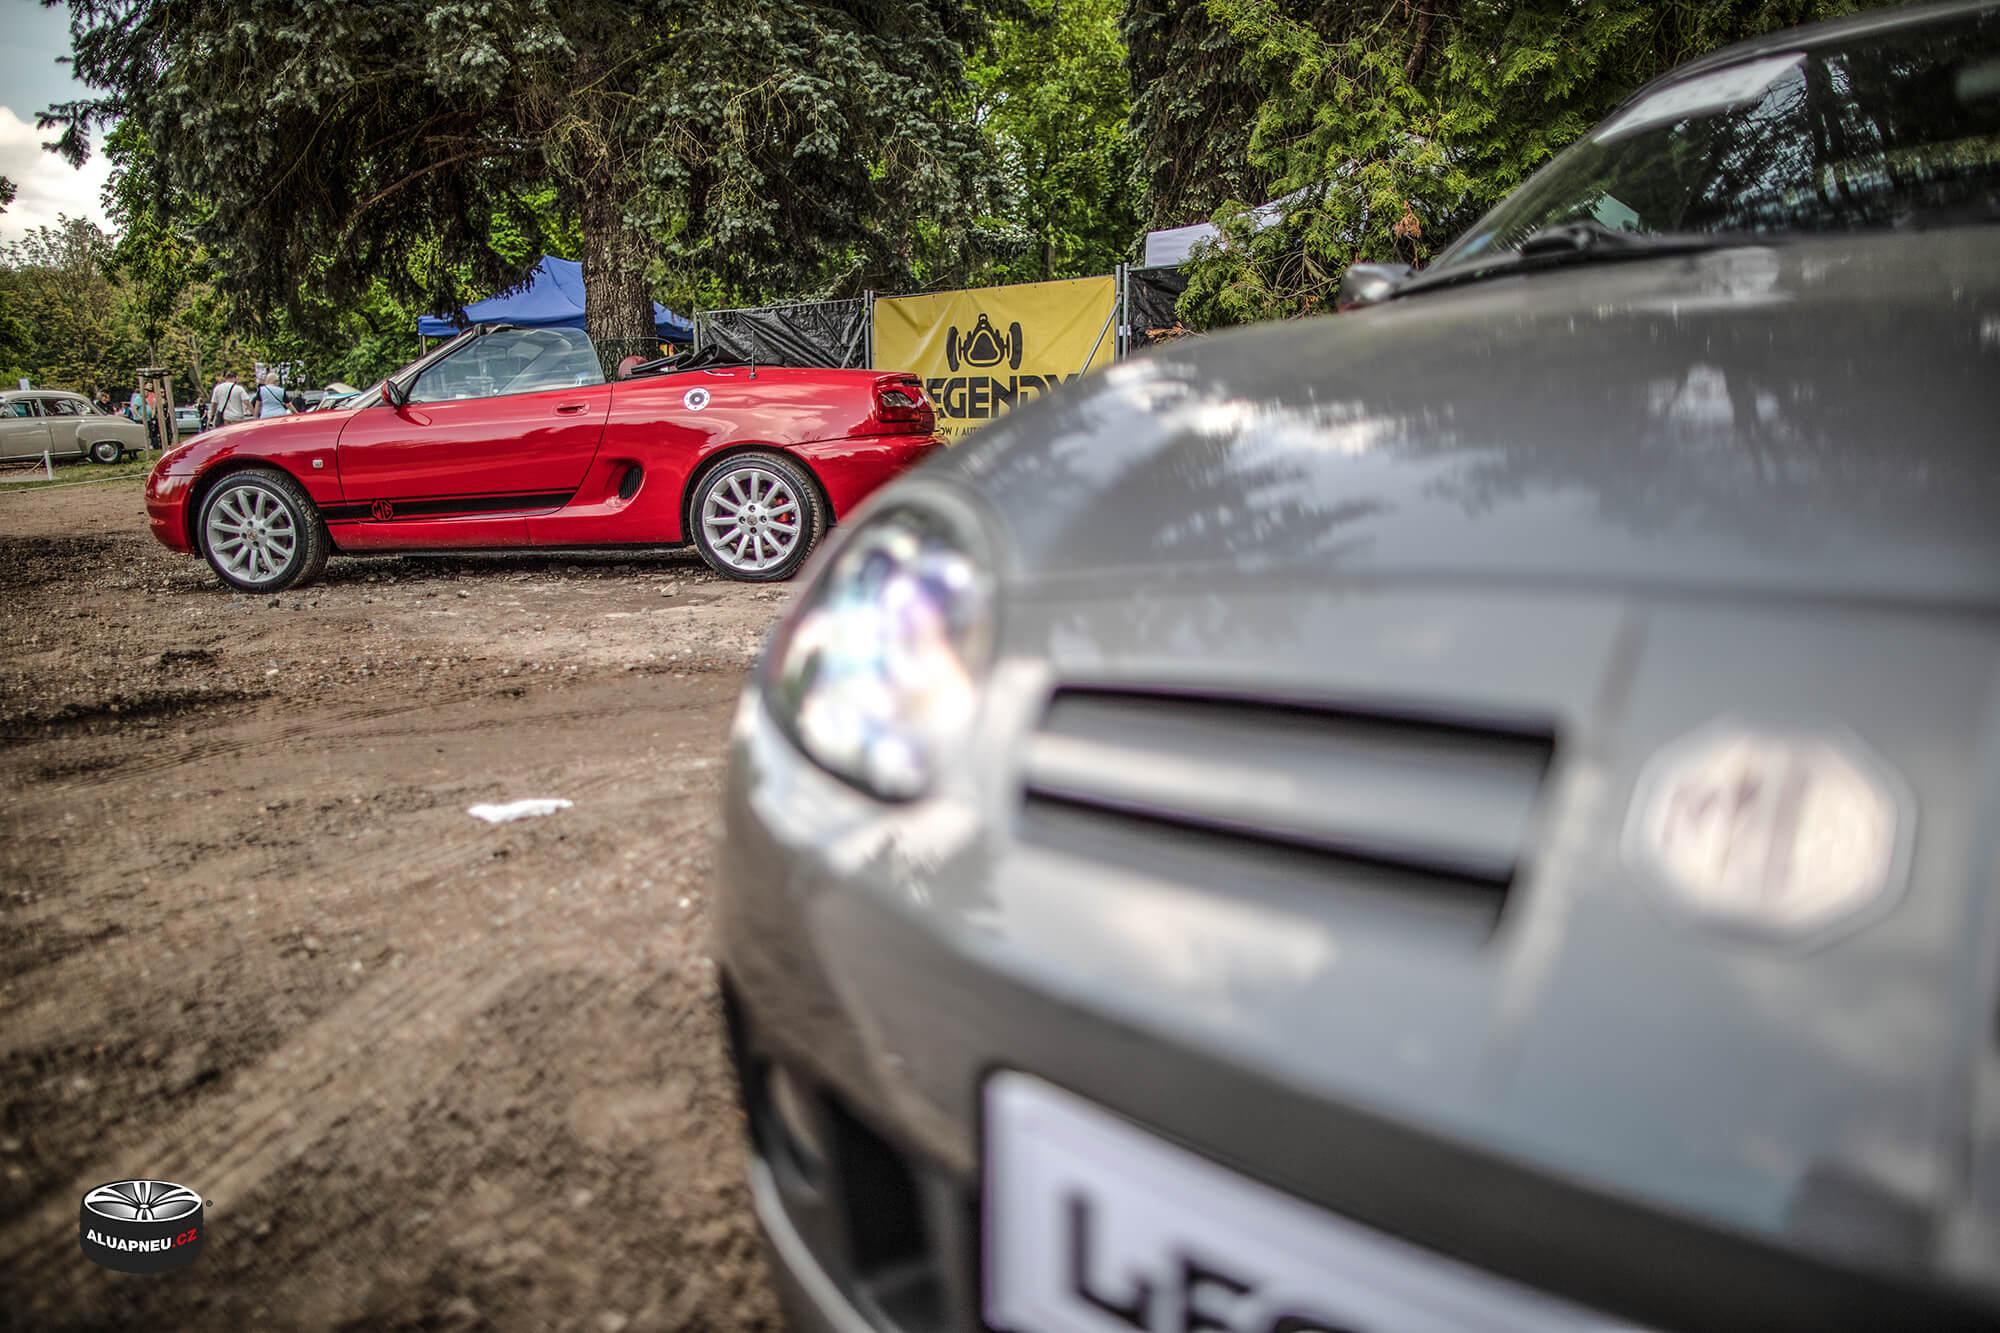 Stříbrná alu kola MG cabrio - Automobilové Legendy 2019 - www.aluapneu.cz